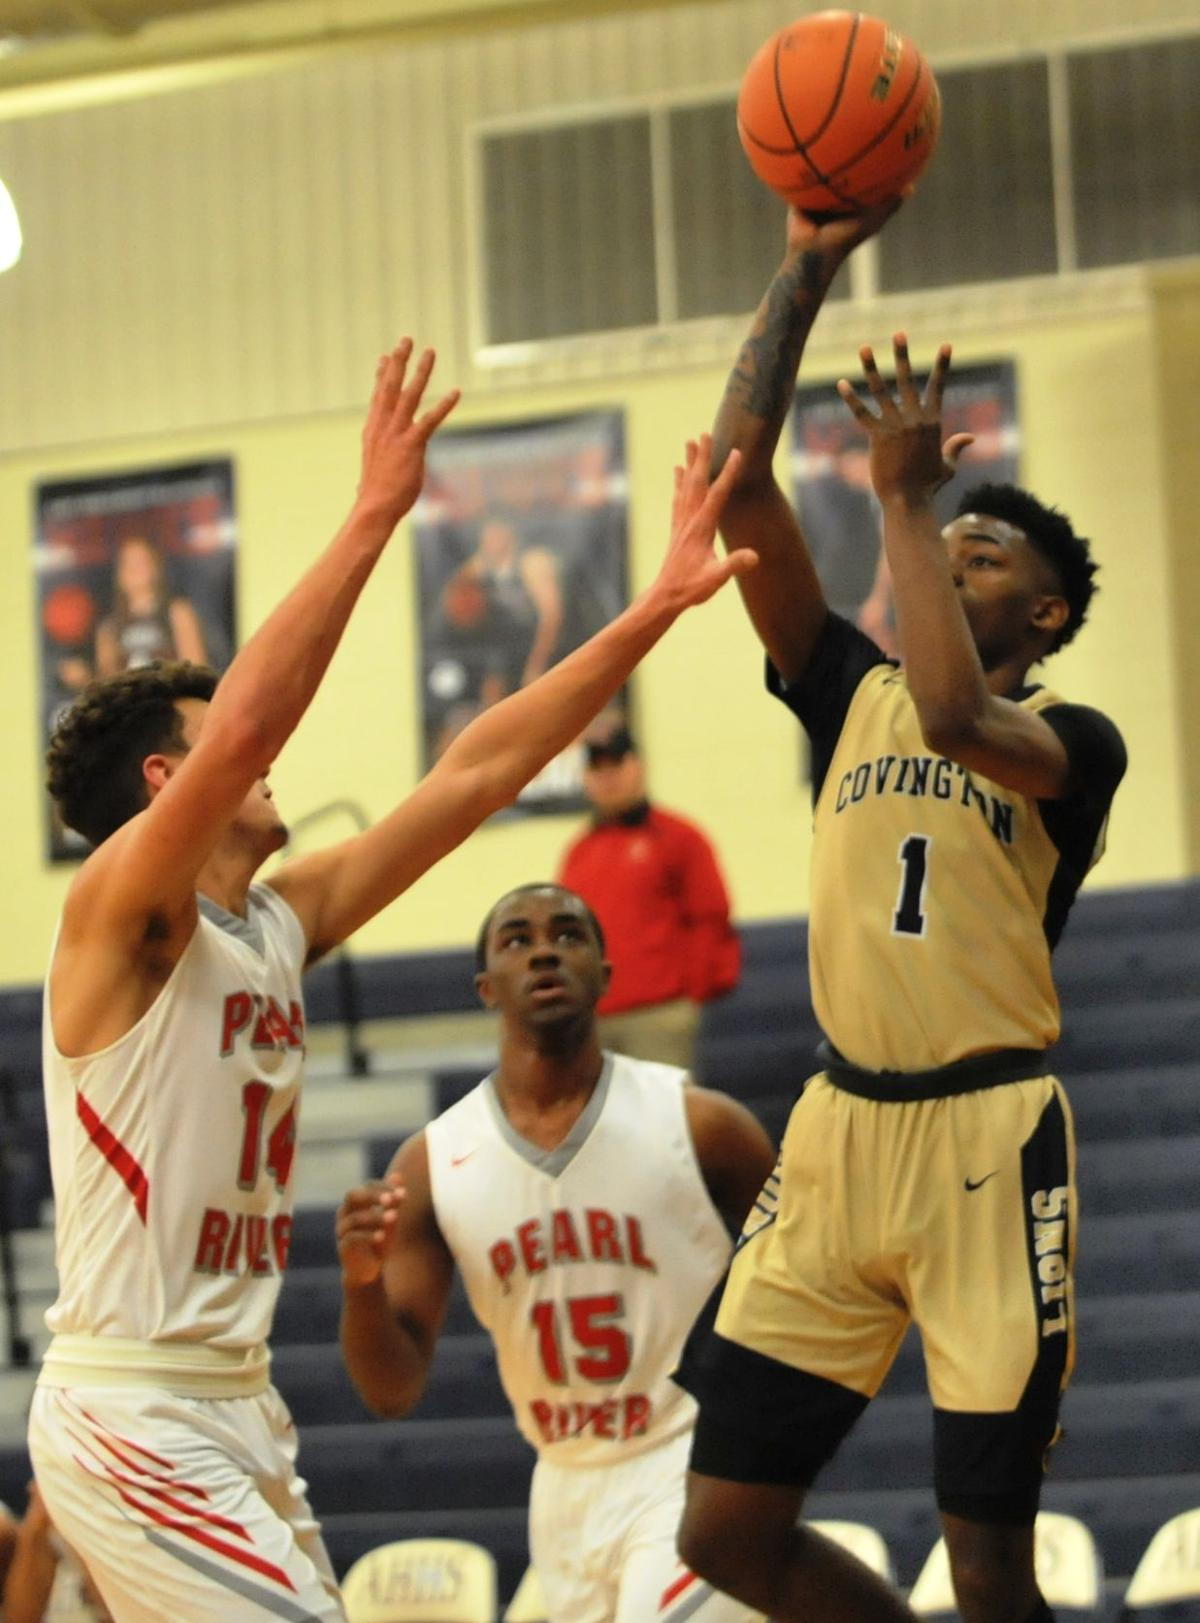 Sheldon Baham (Covington High Boys Basketball)